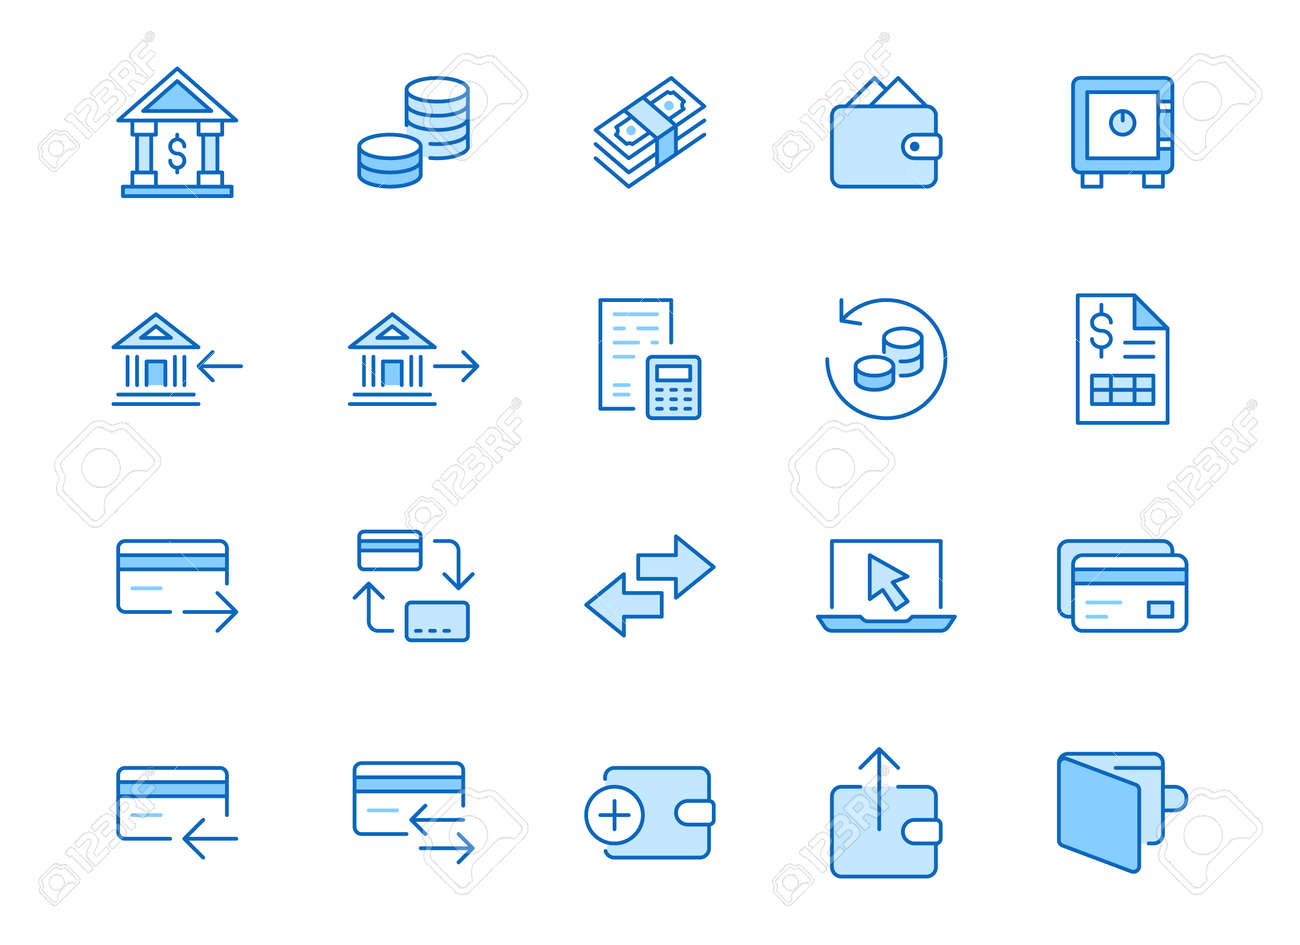 Finance line icon set. Money transfer, bank account, credit card payment cash back minimal vector illustration. Simple outline sign for online banking application. Blue color, Editable Stroke. - 160075229